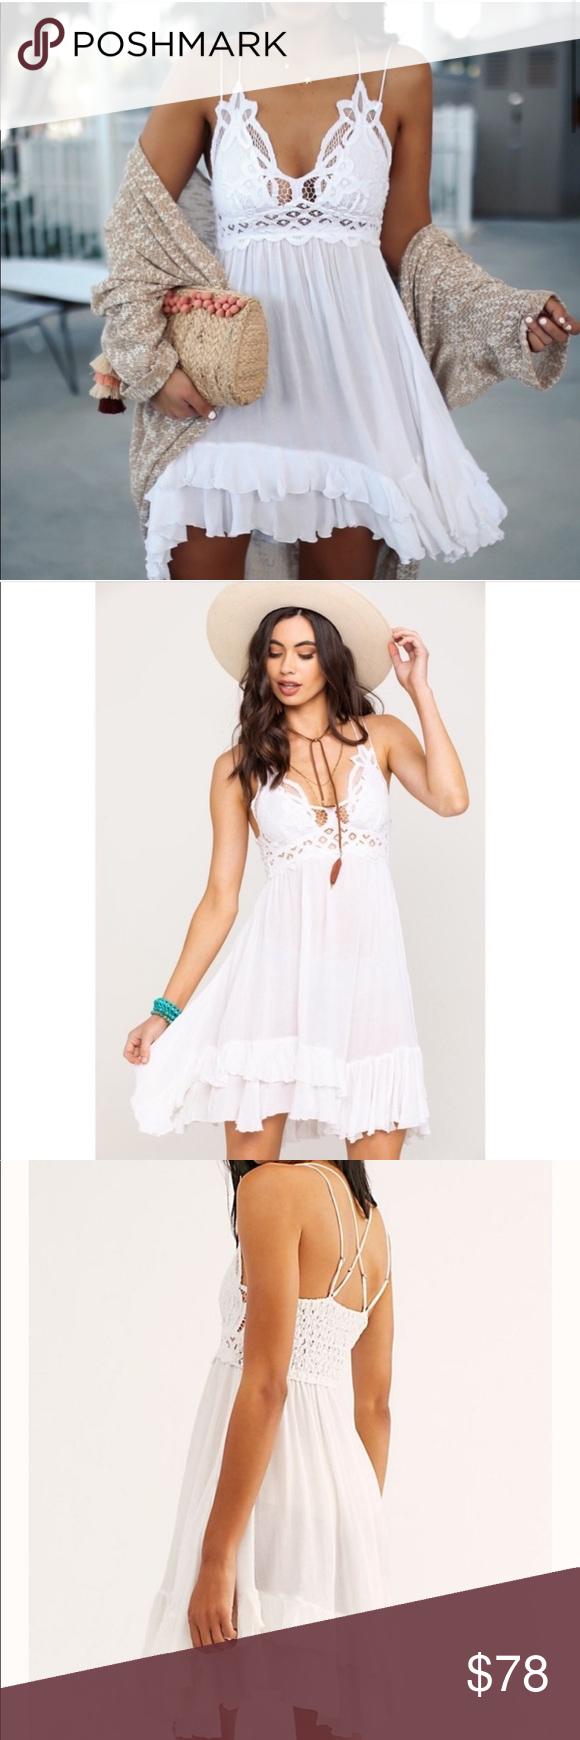 Free People Adella Lace Dress White Lace White Dress Lace Dress Lace Slip Dress [ 1740 x 580 Pixel ]